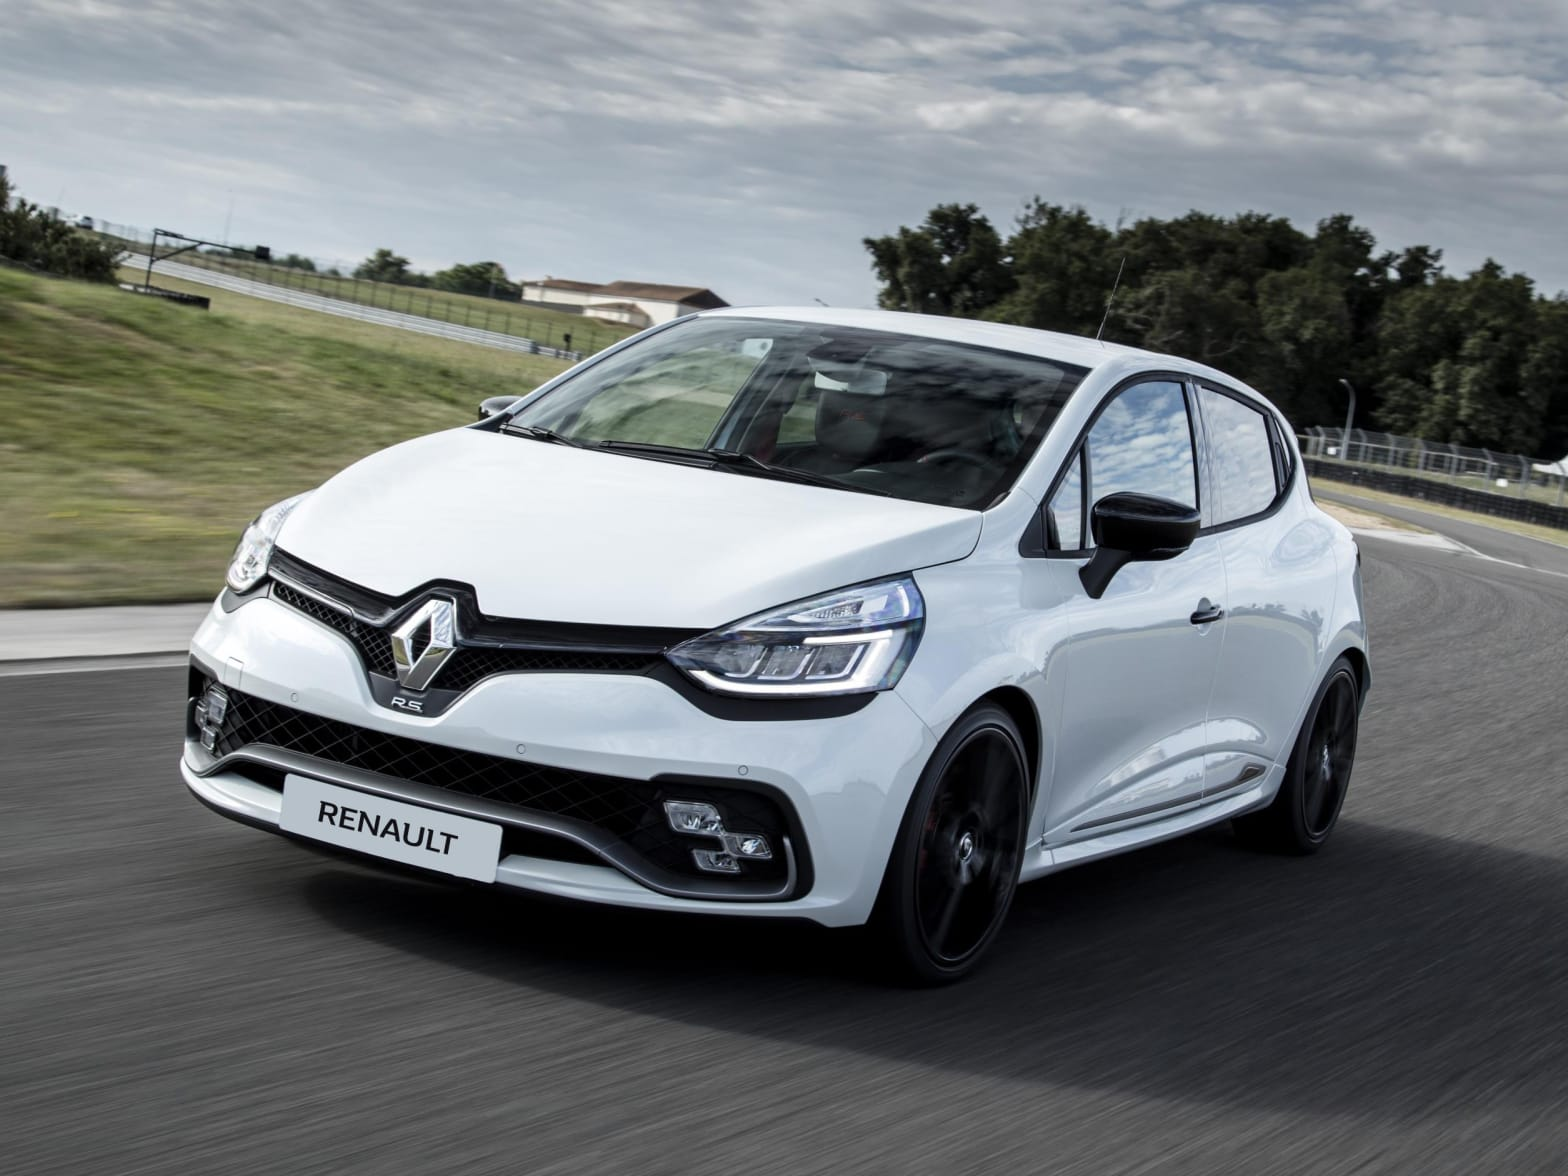 New Renault Clio | Smiths Peterborough